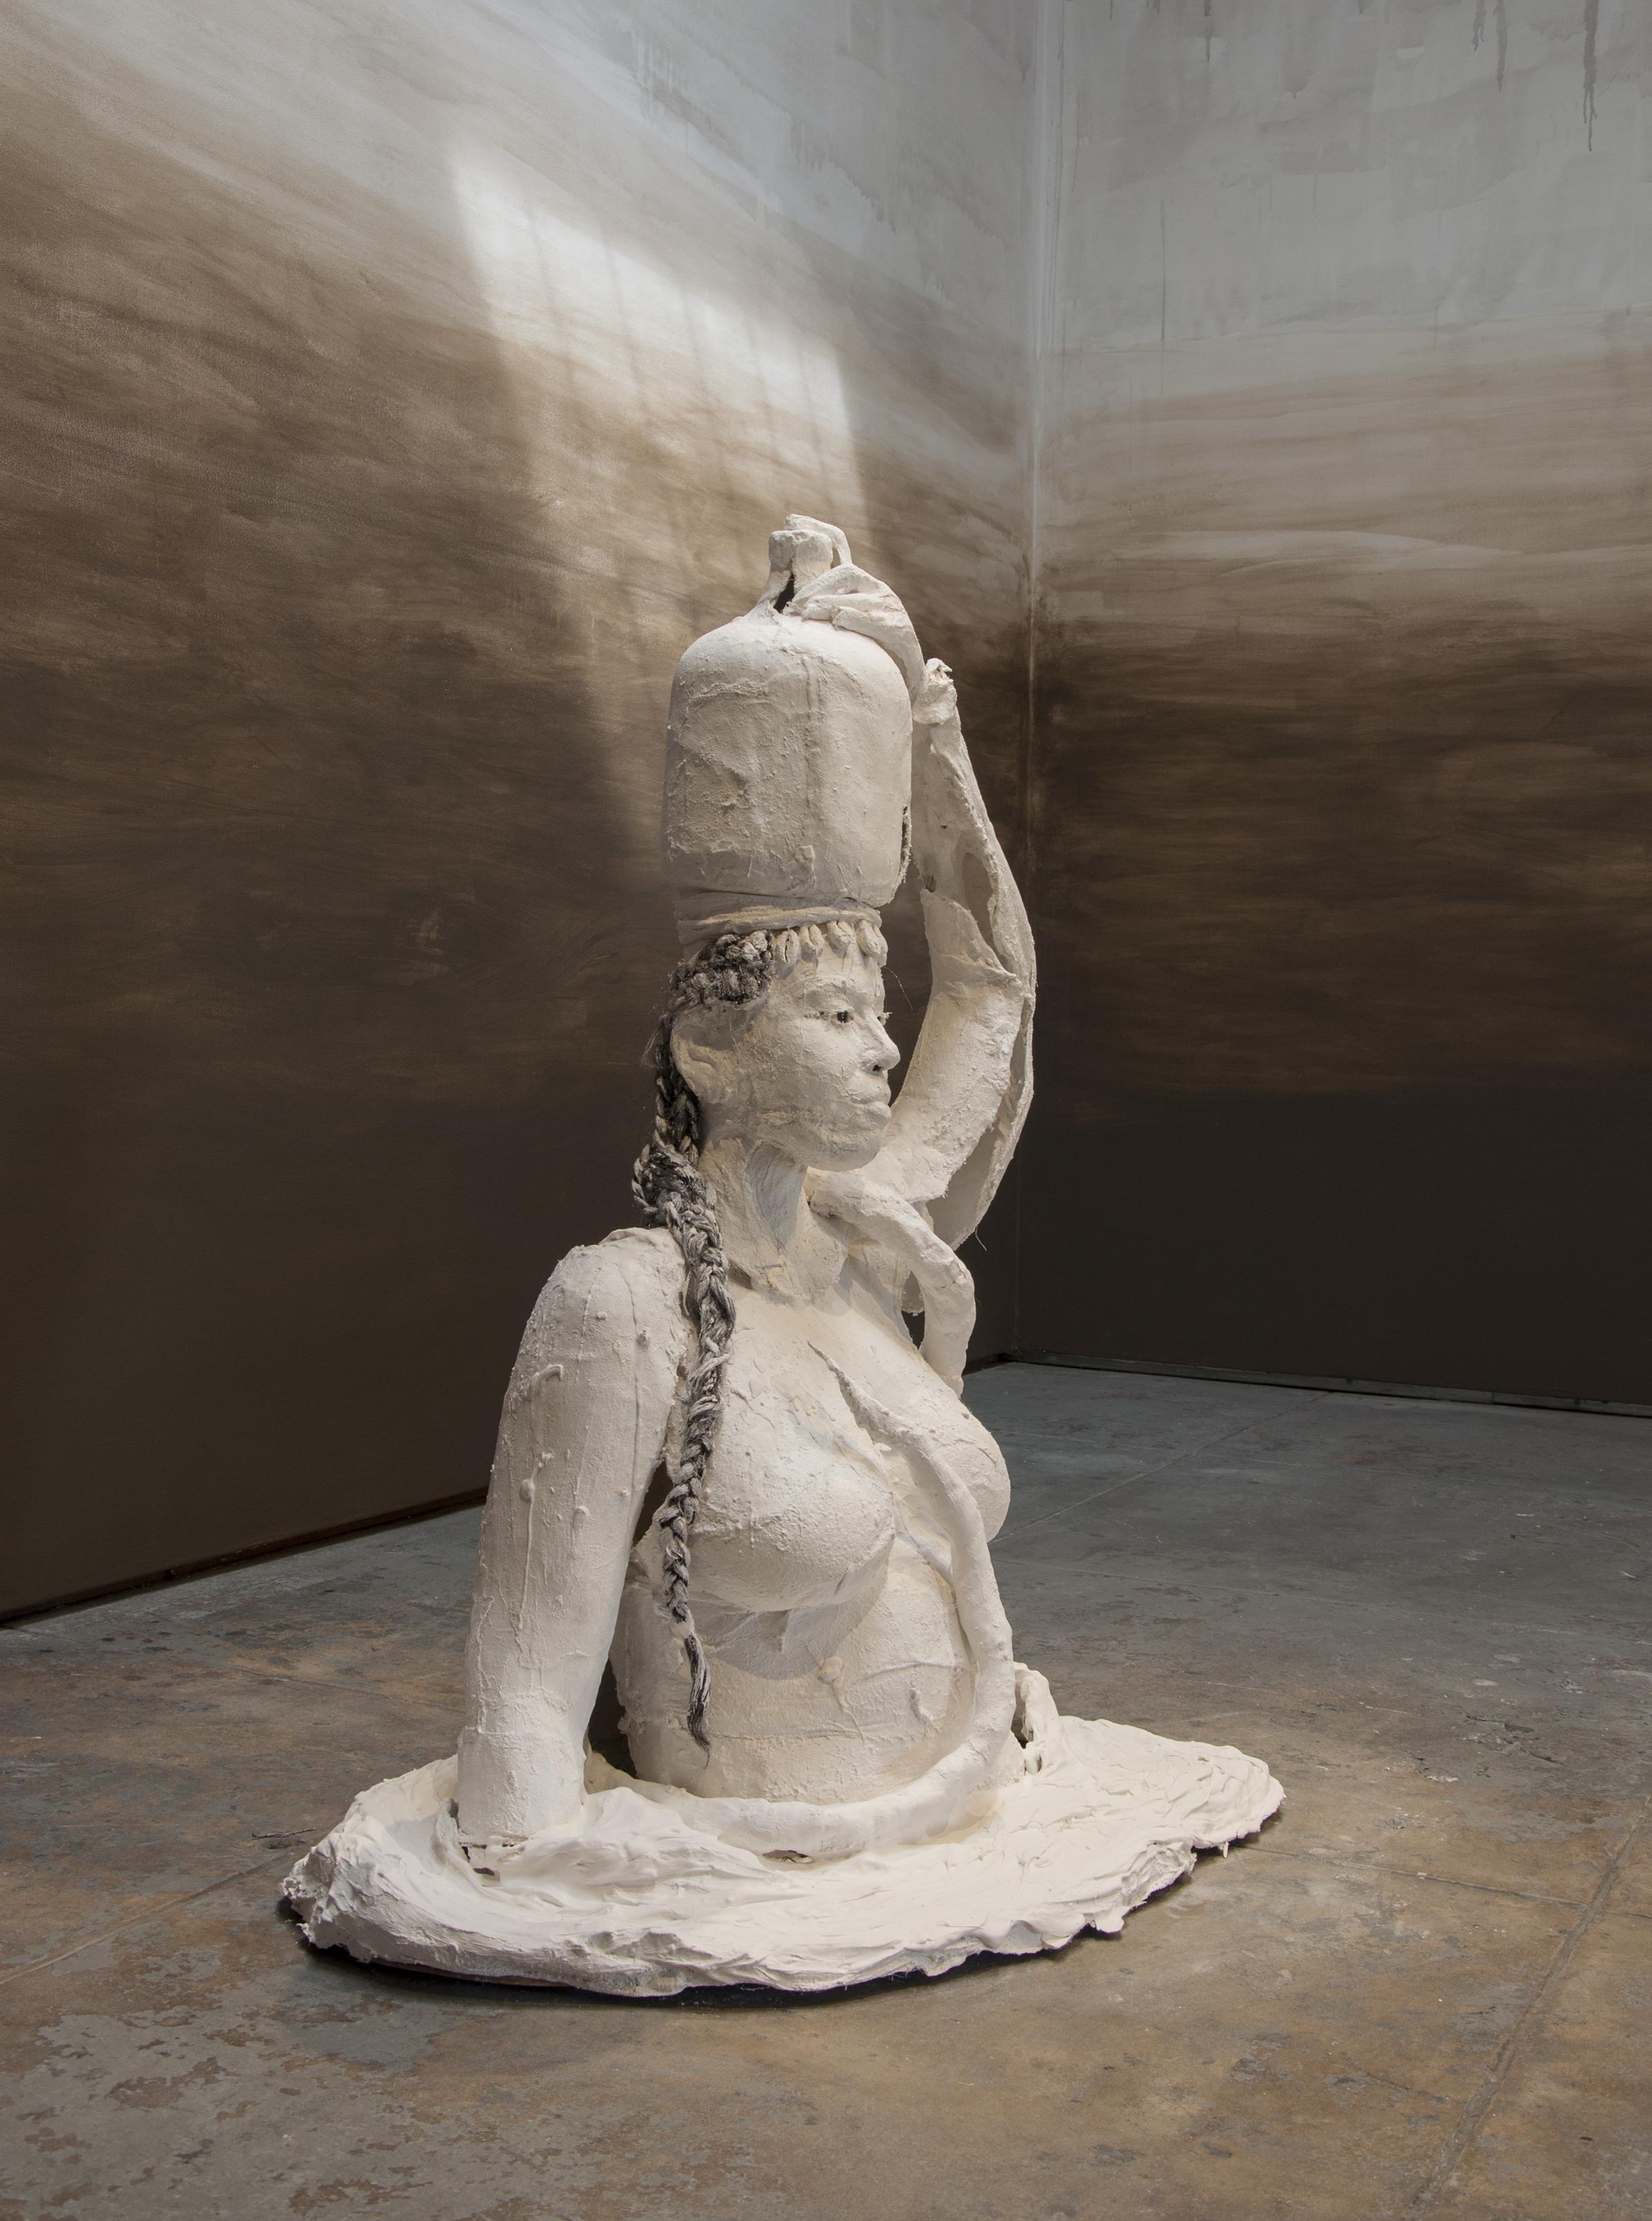 Karon Davis,  Muddy Water.  Courtesy of Wilding Cran Gallery.